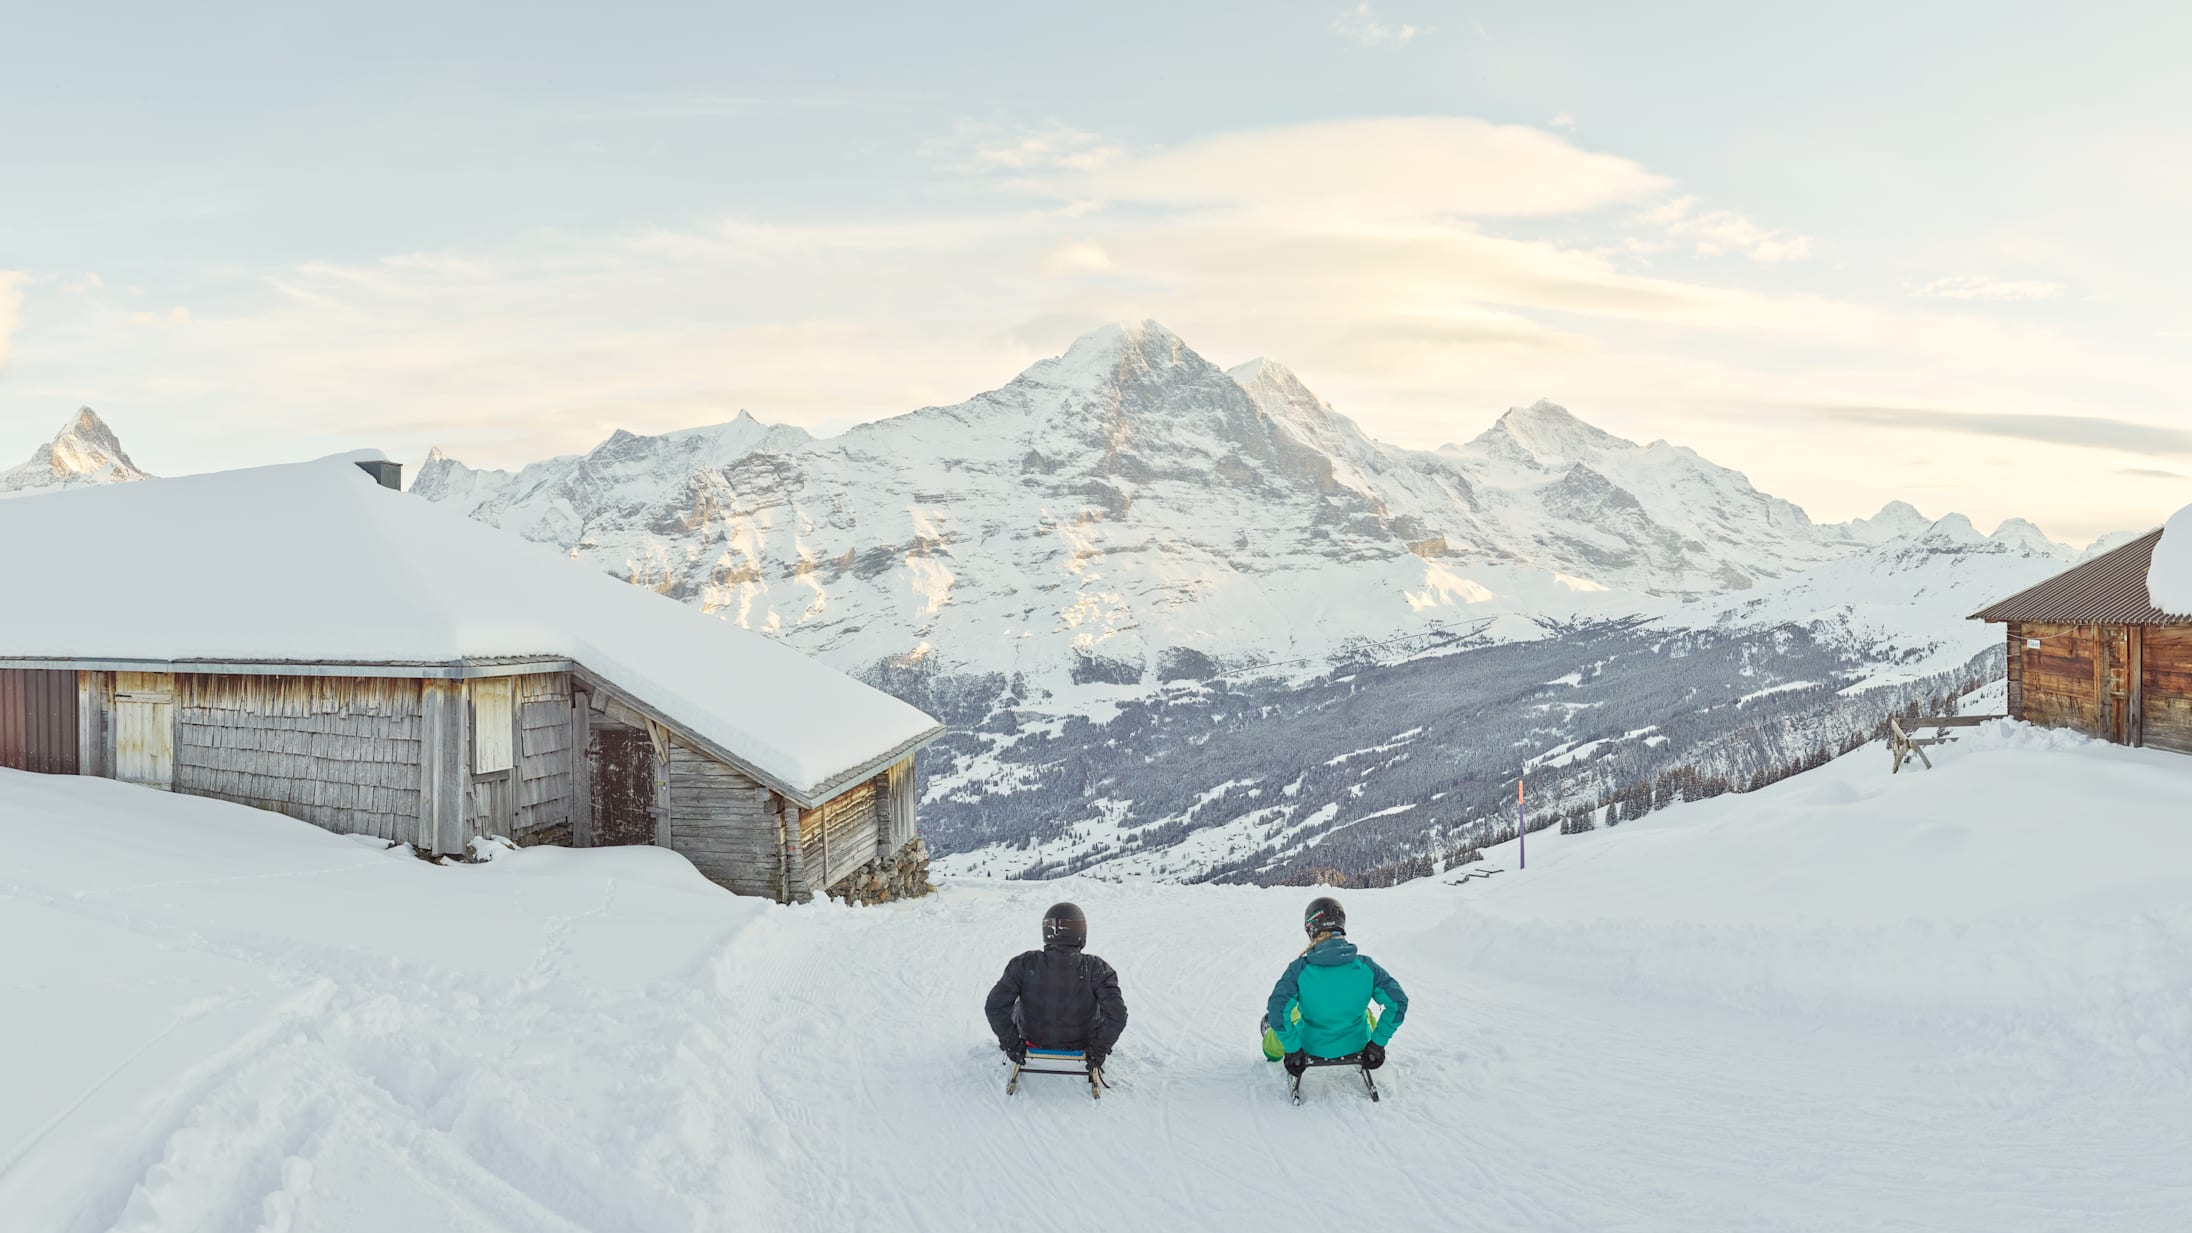 Luge Grindelwald Bussalp Eiger Moench Jungfrau